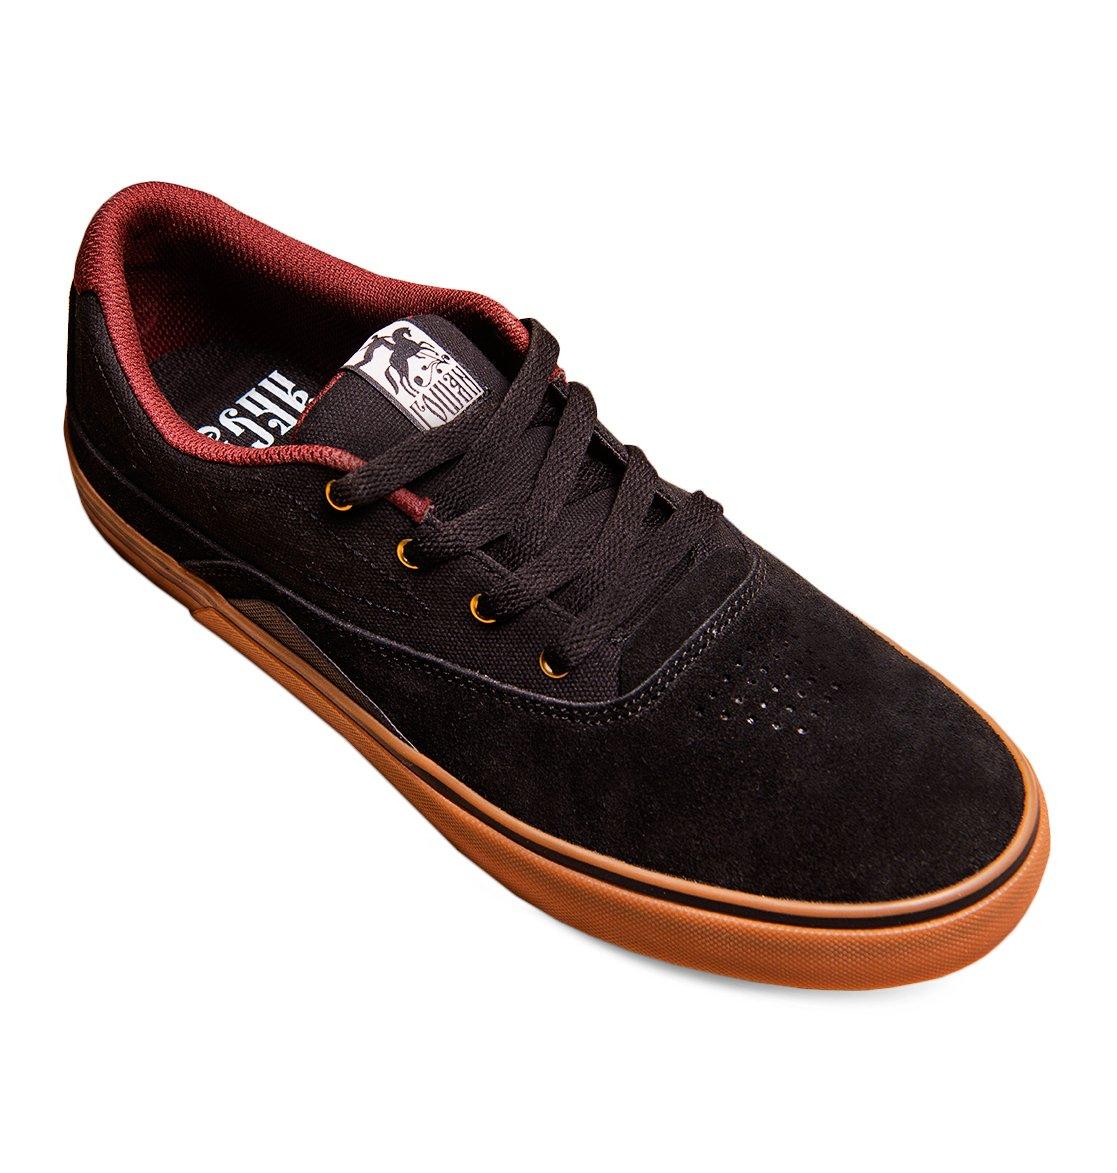 a12f0abfe4 1 Sultan S Gosha - Low-Top Shoes ADYS300333 DC Shoes